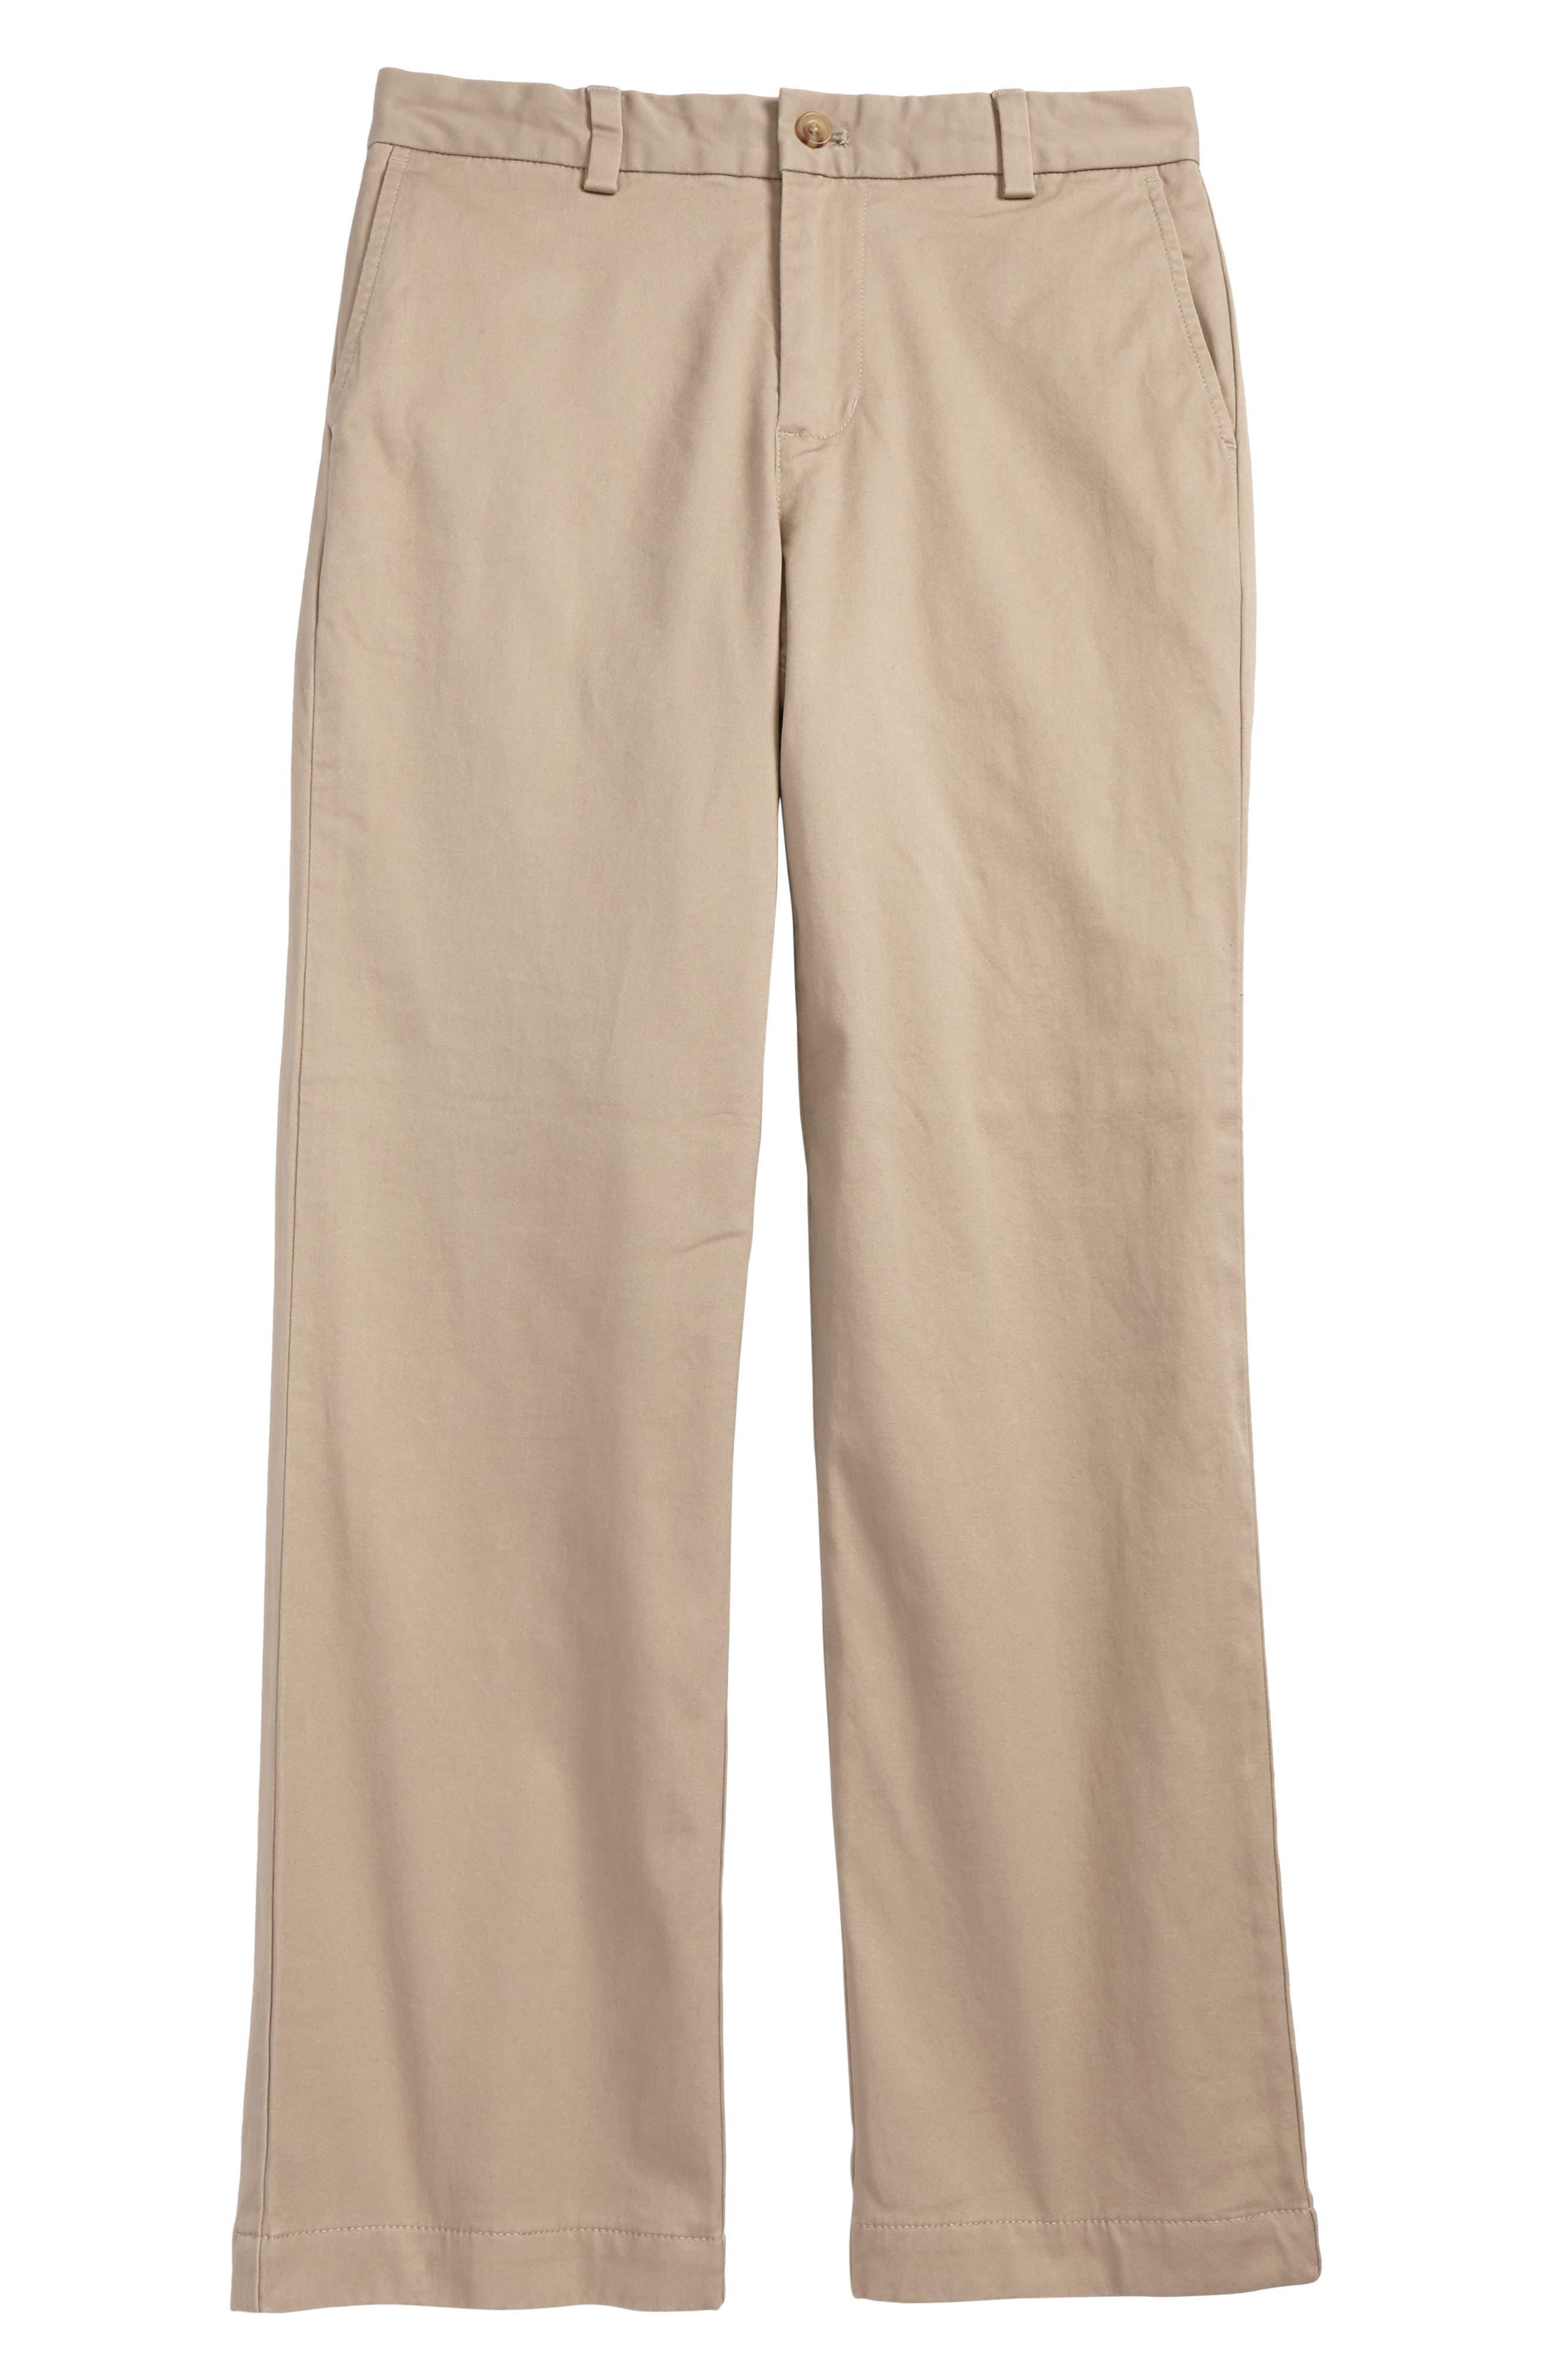 Breaker Flannel Lined Pants,                             Main thumbnail 1, color,                             Khaki